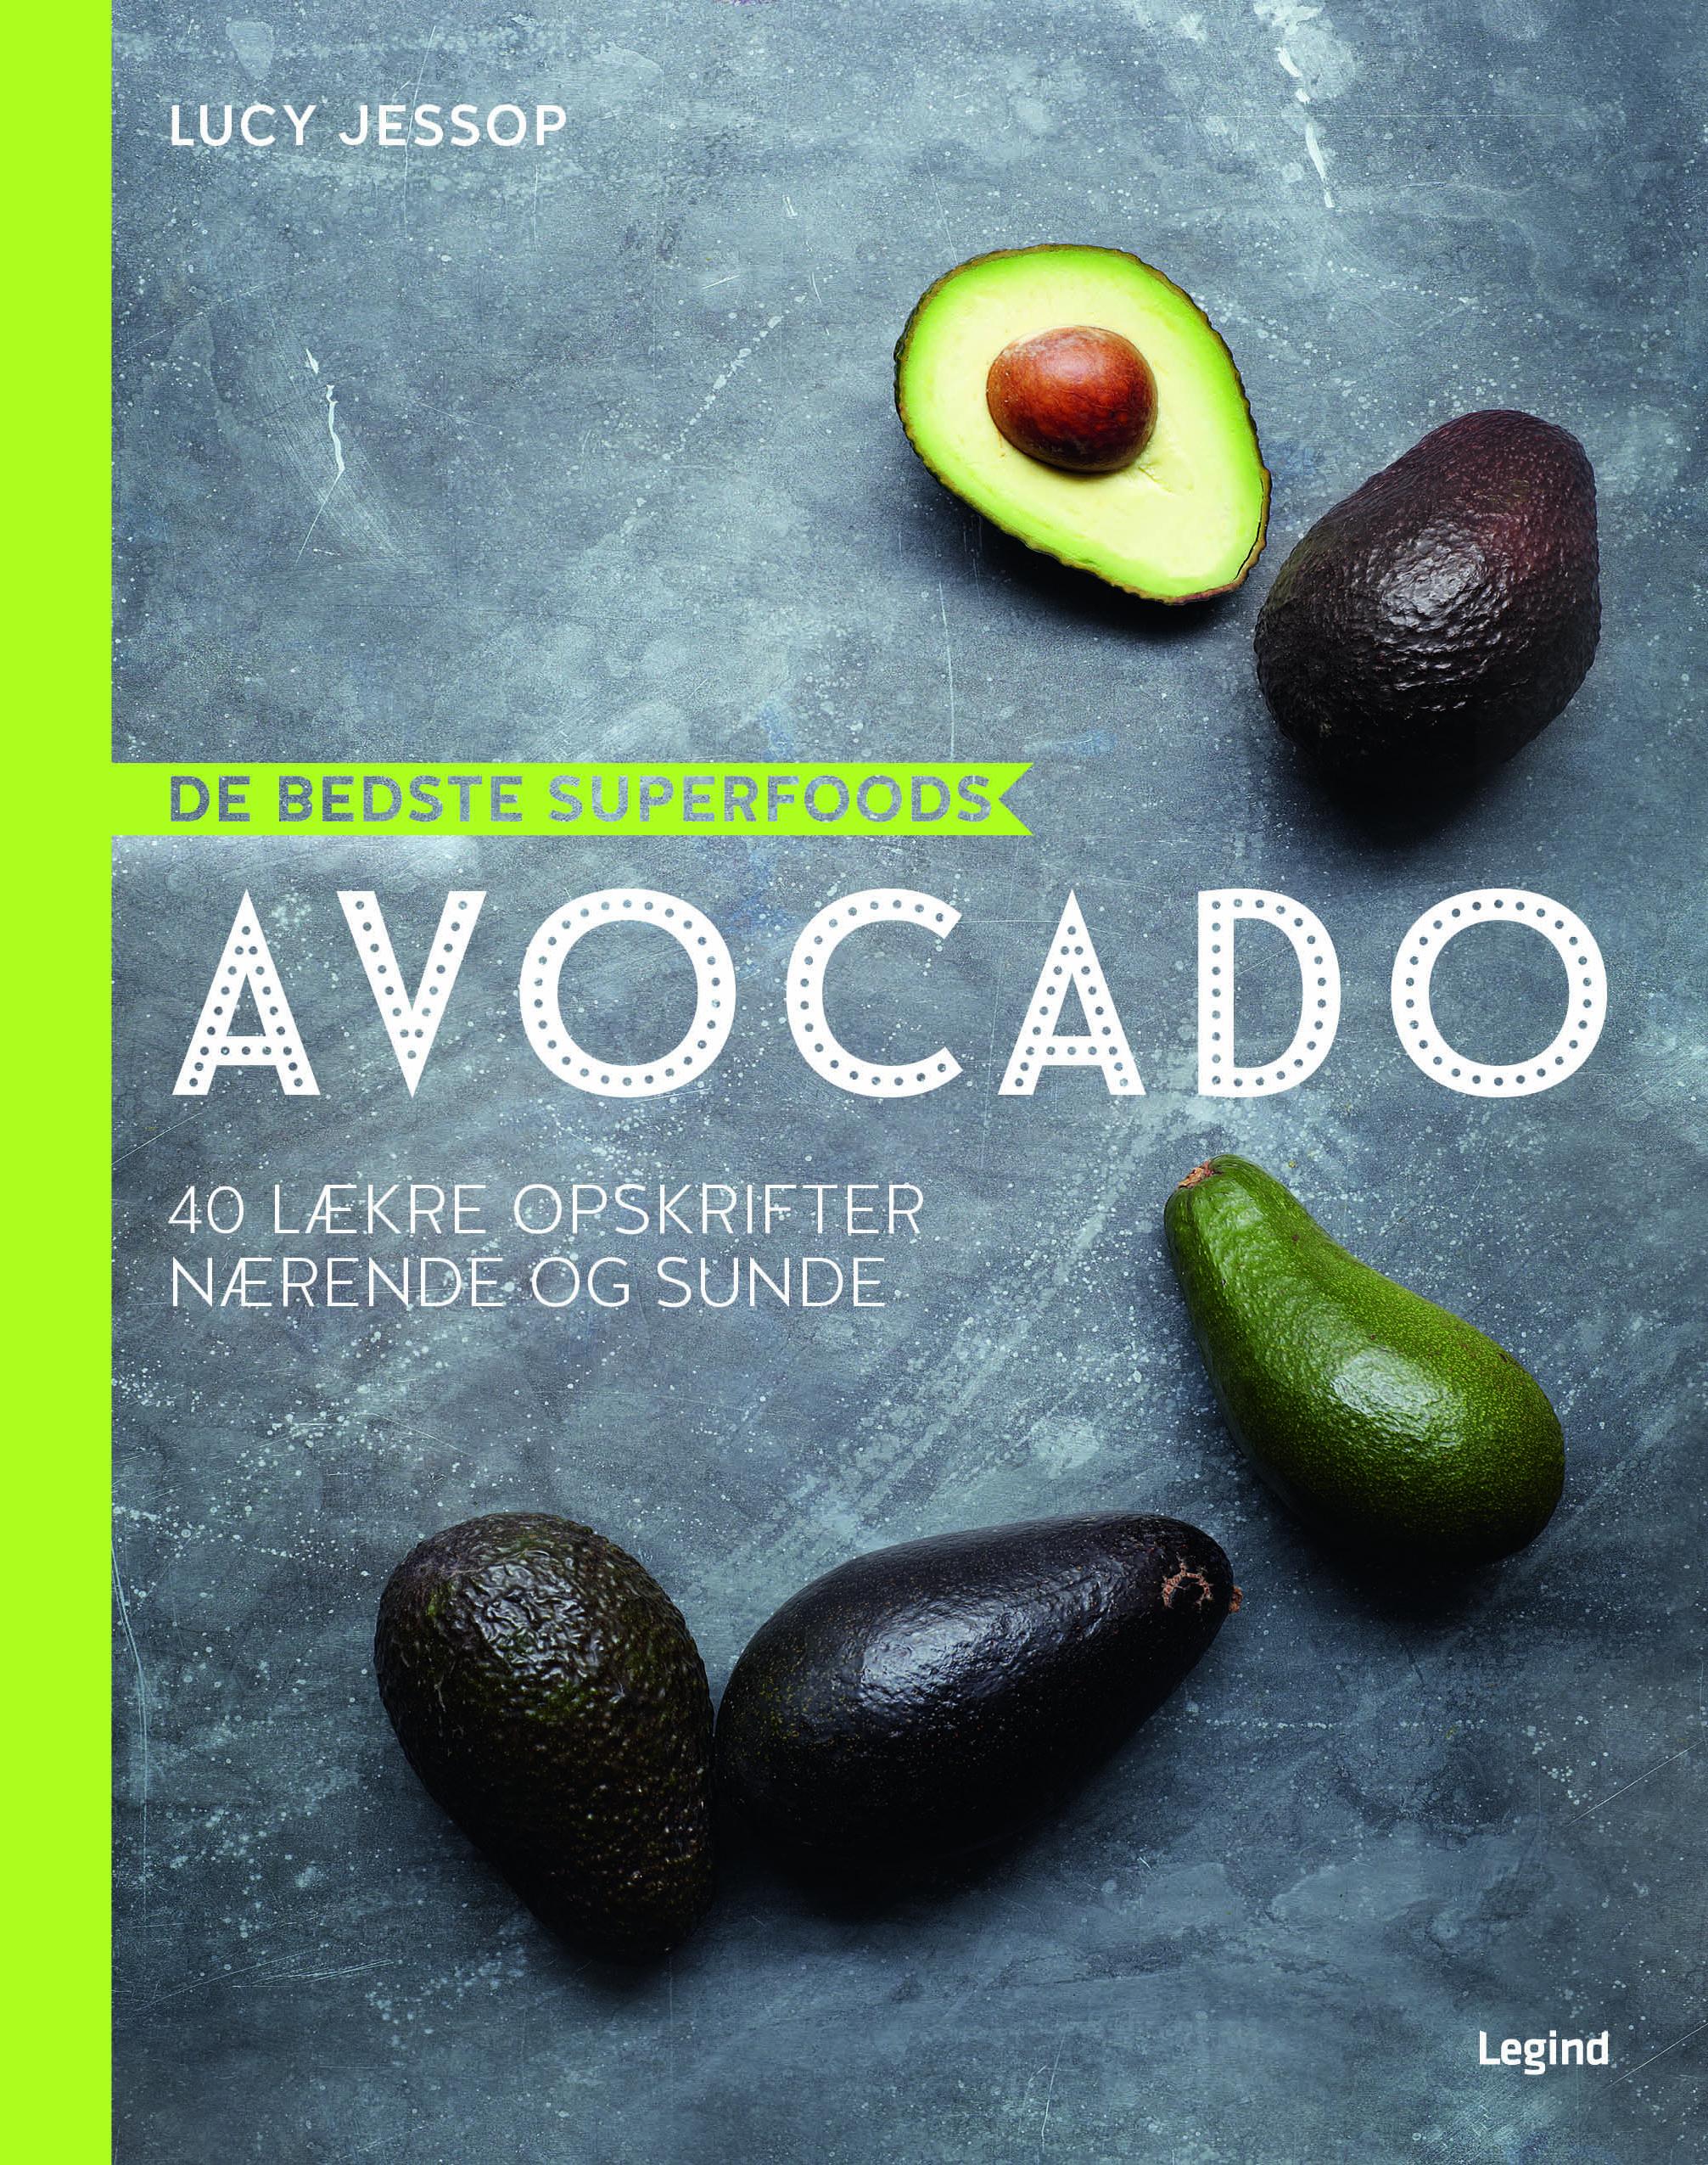 Avocado - Design by Martin Flink